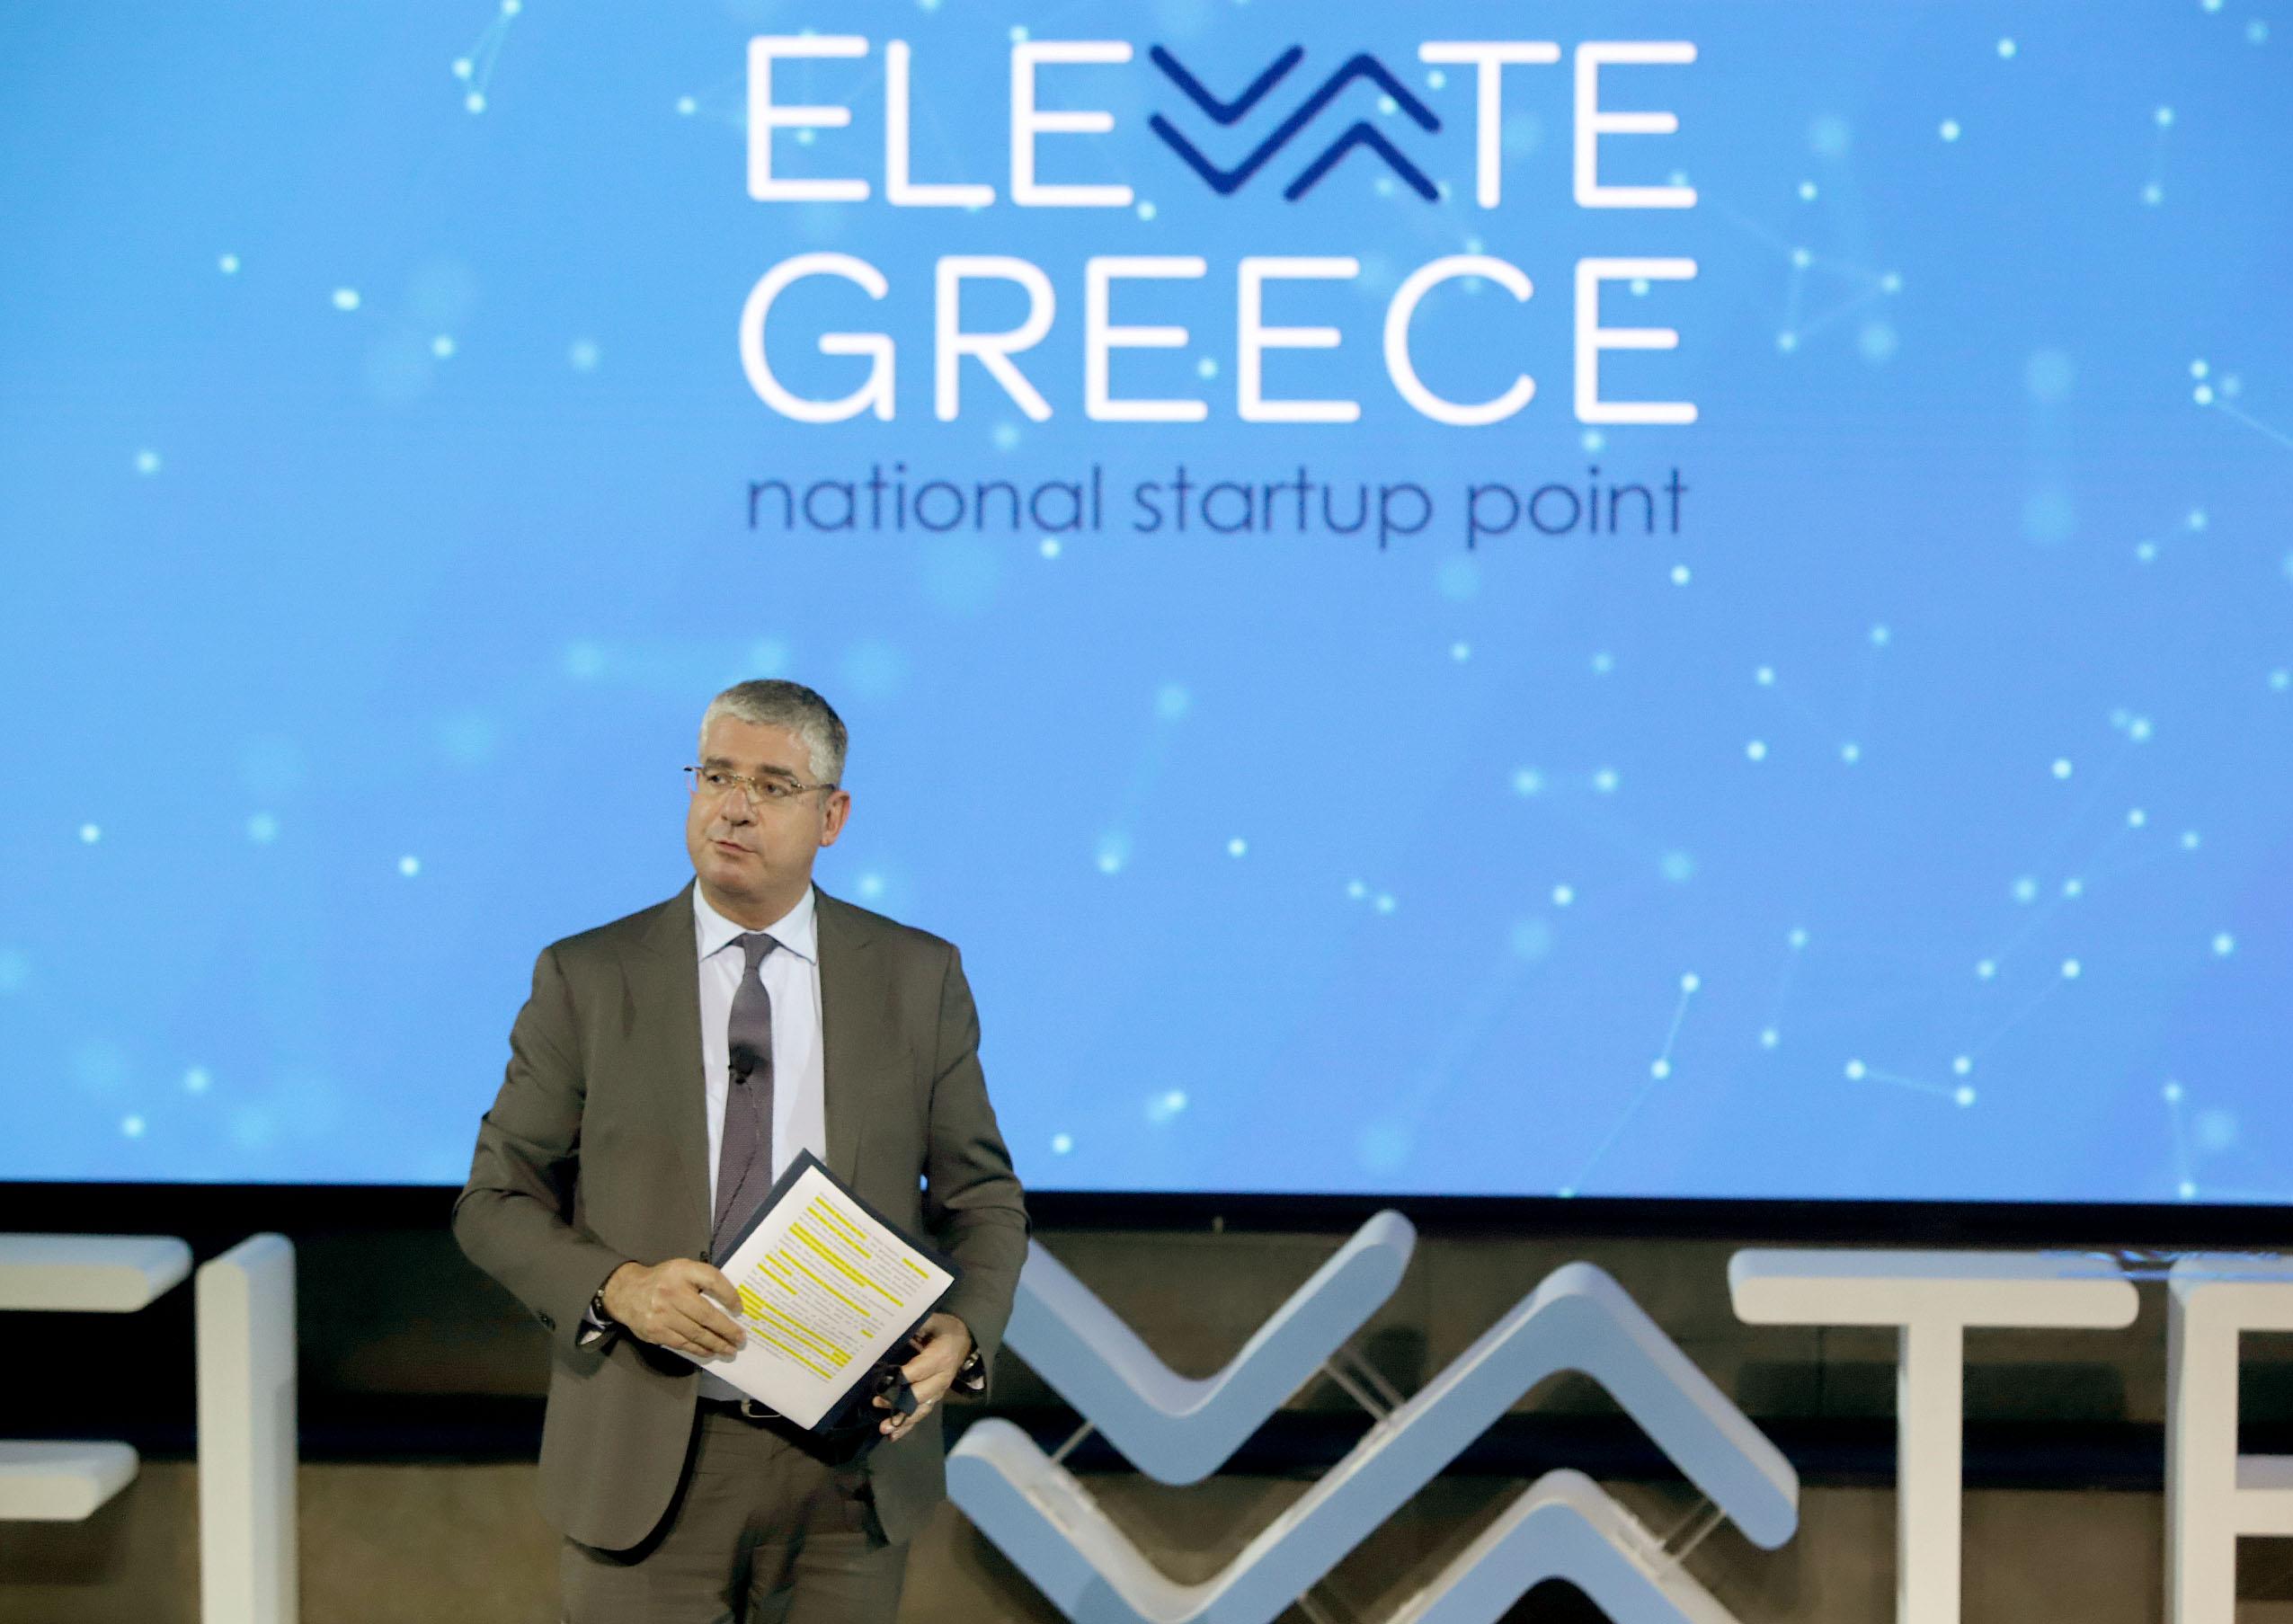 Elevate Greece - Hλεκτρονική πύλη για εγγραφή νεοφυών επιχειρήσεων - Προϋποθέσεις εγγραφής – προθεσμία αιτήσεων